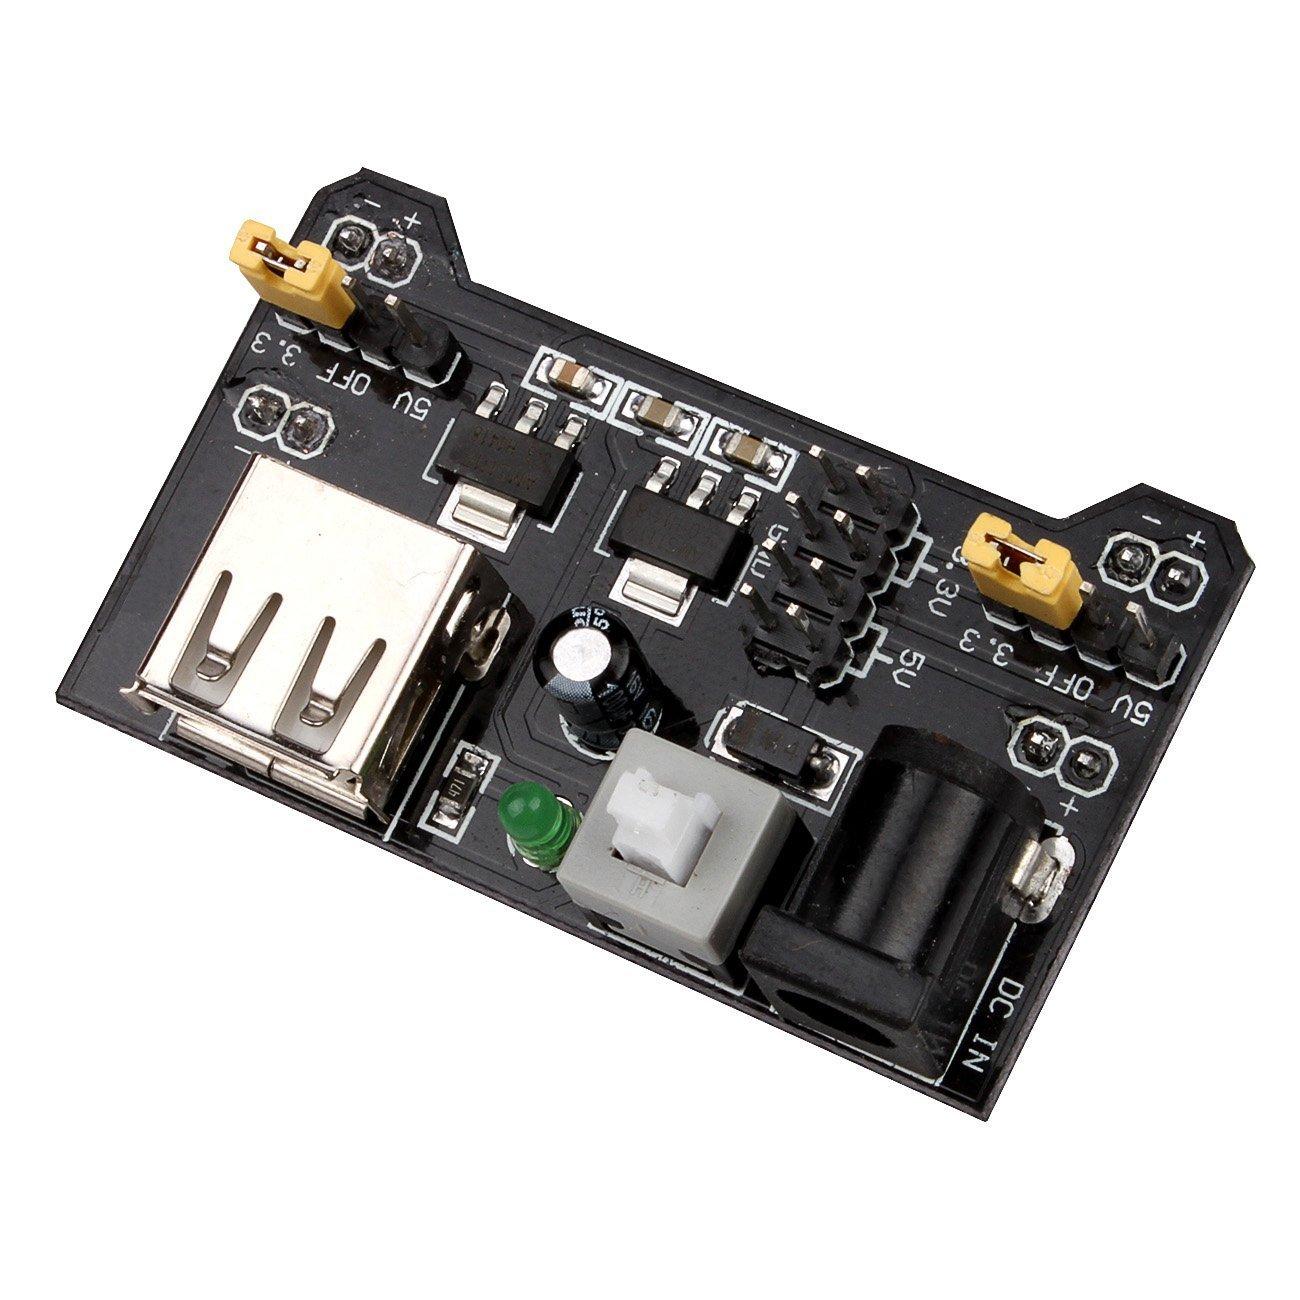 Amazon.com: JBtek Breadboard Power Supply Module 3.3V/5V For Arduino ...